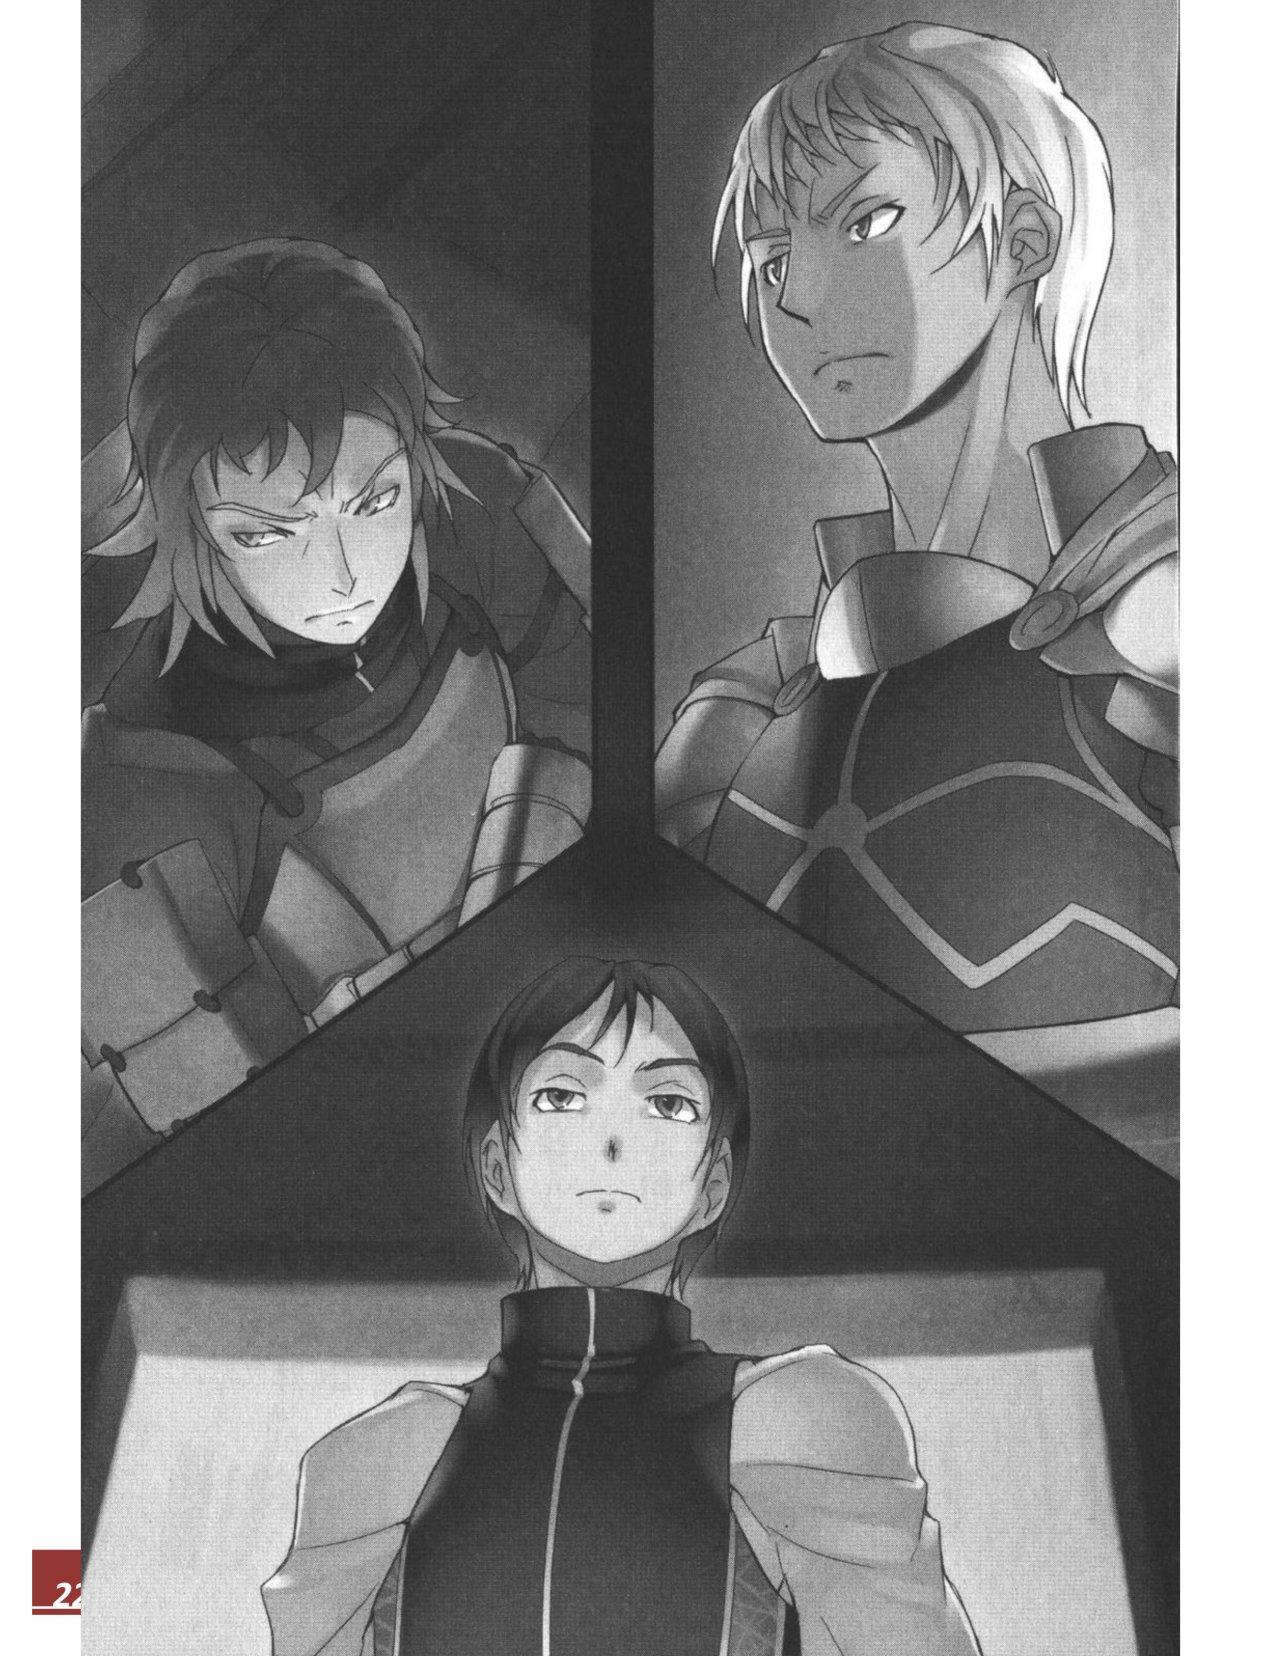 https://c10.mangatag.com/es_manga/pic5/22/25558/782961/159bd4dc464235815cec4c01a42e8153.jpg Page 22